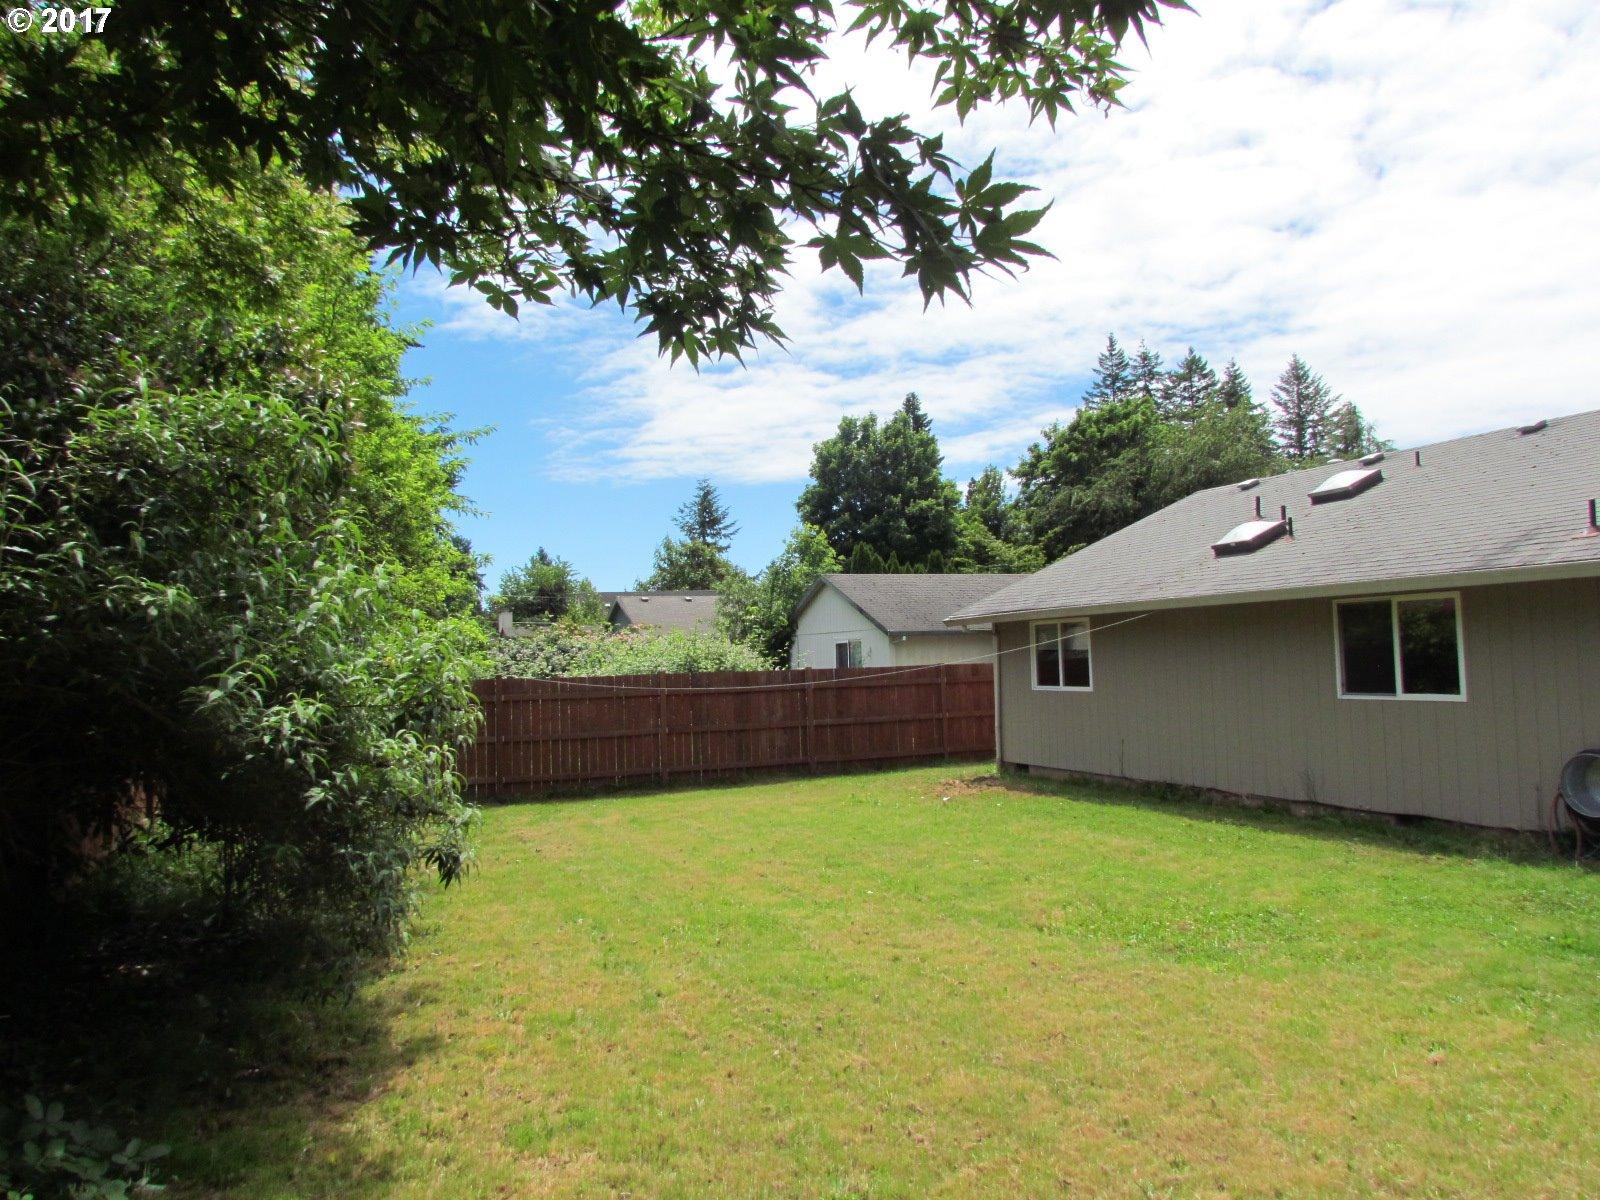 17043 SE STEPHENS ST Portland, OR 97233 - MLS #: 17581965